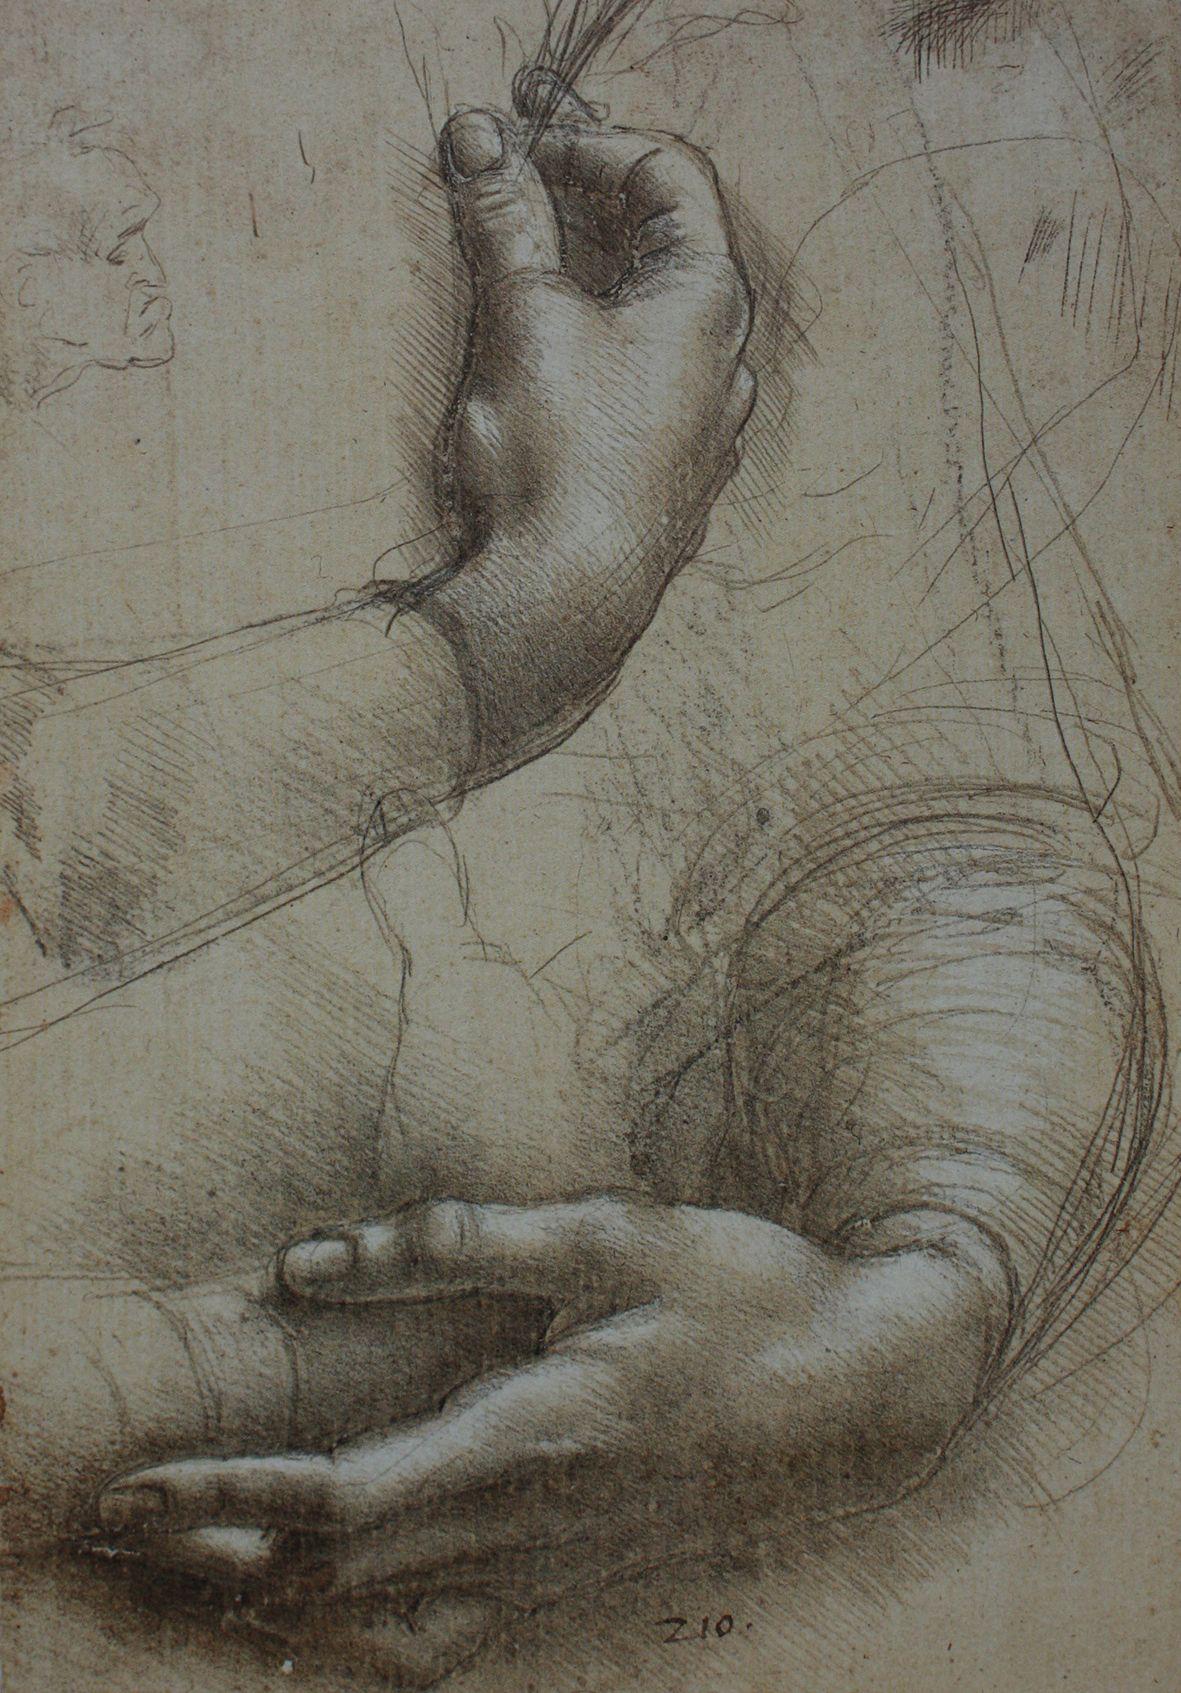 Estudio anatómico de manos. Es un grabado realizado por Leonardo da ...